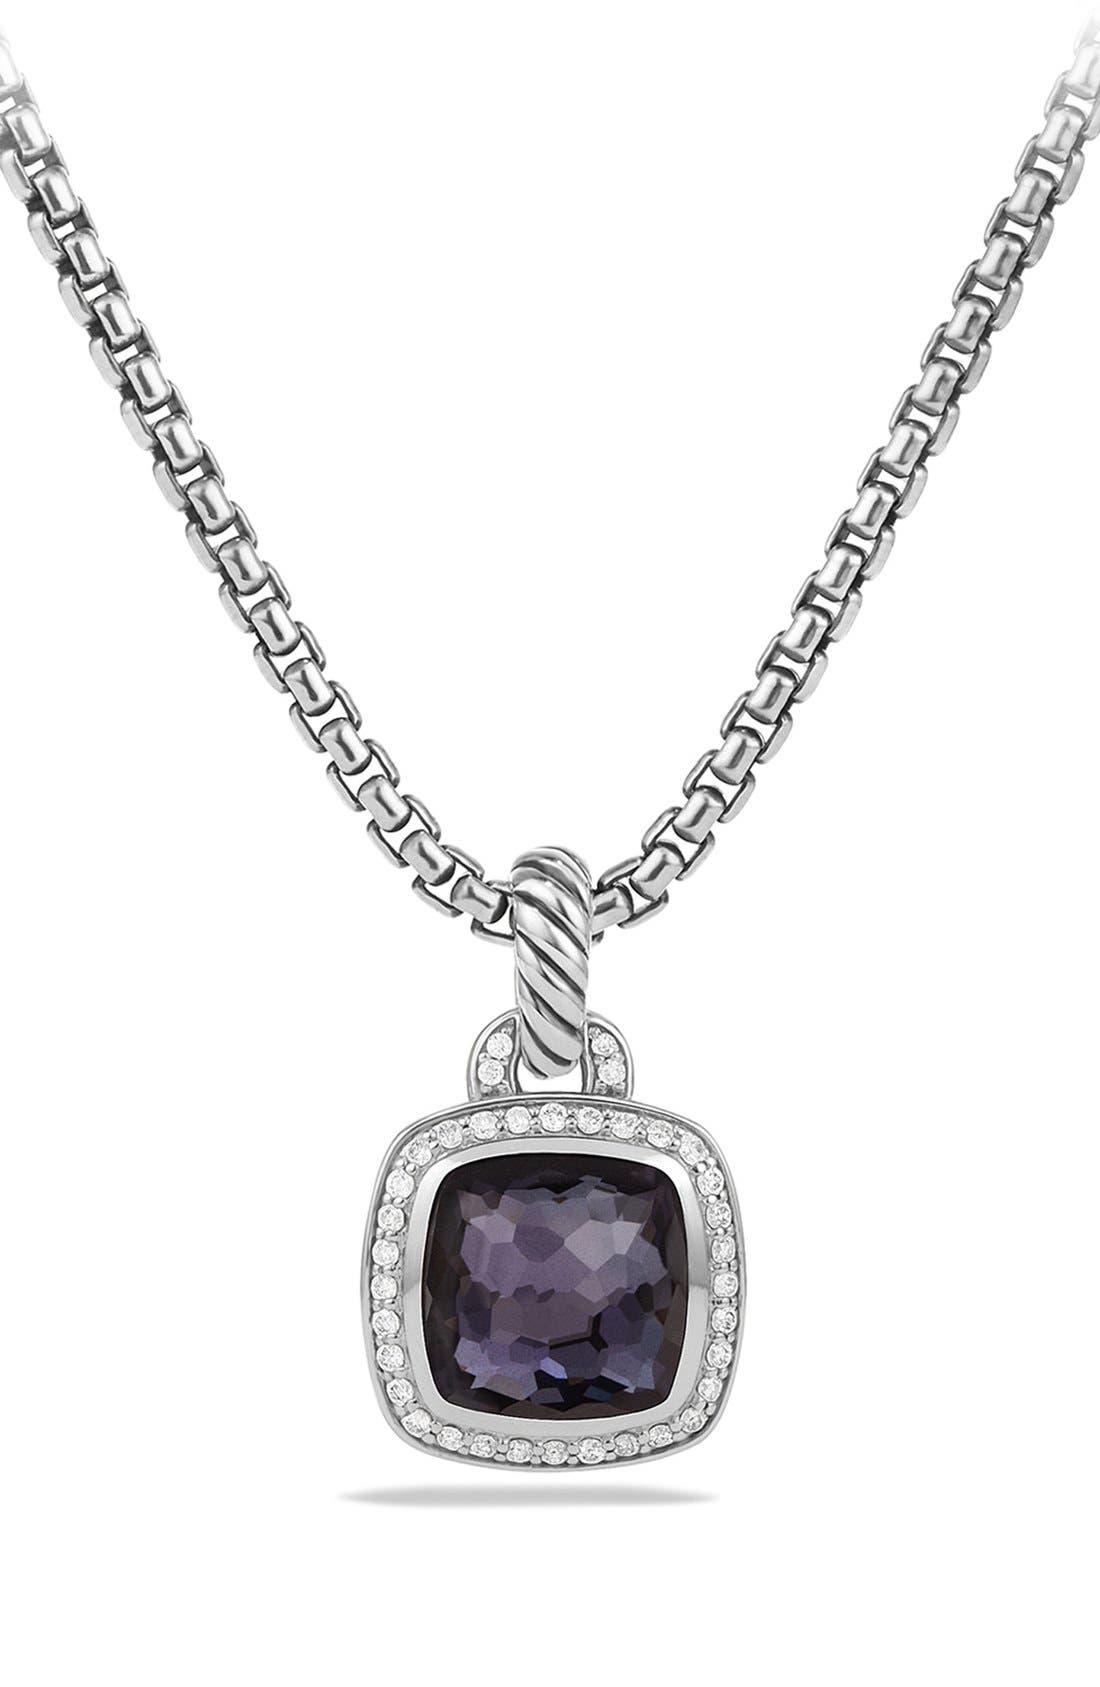 David Yurman'Albion' Pendant and Diamonds